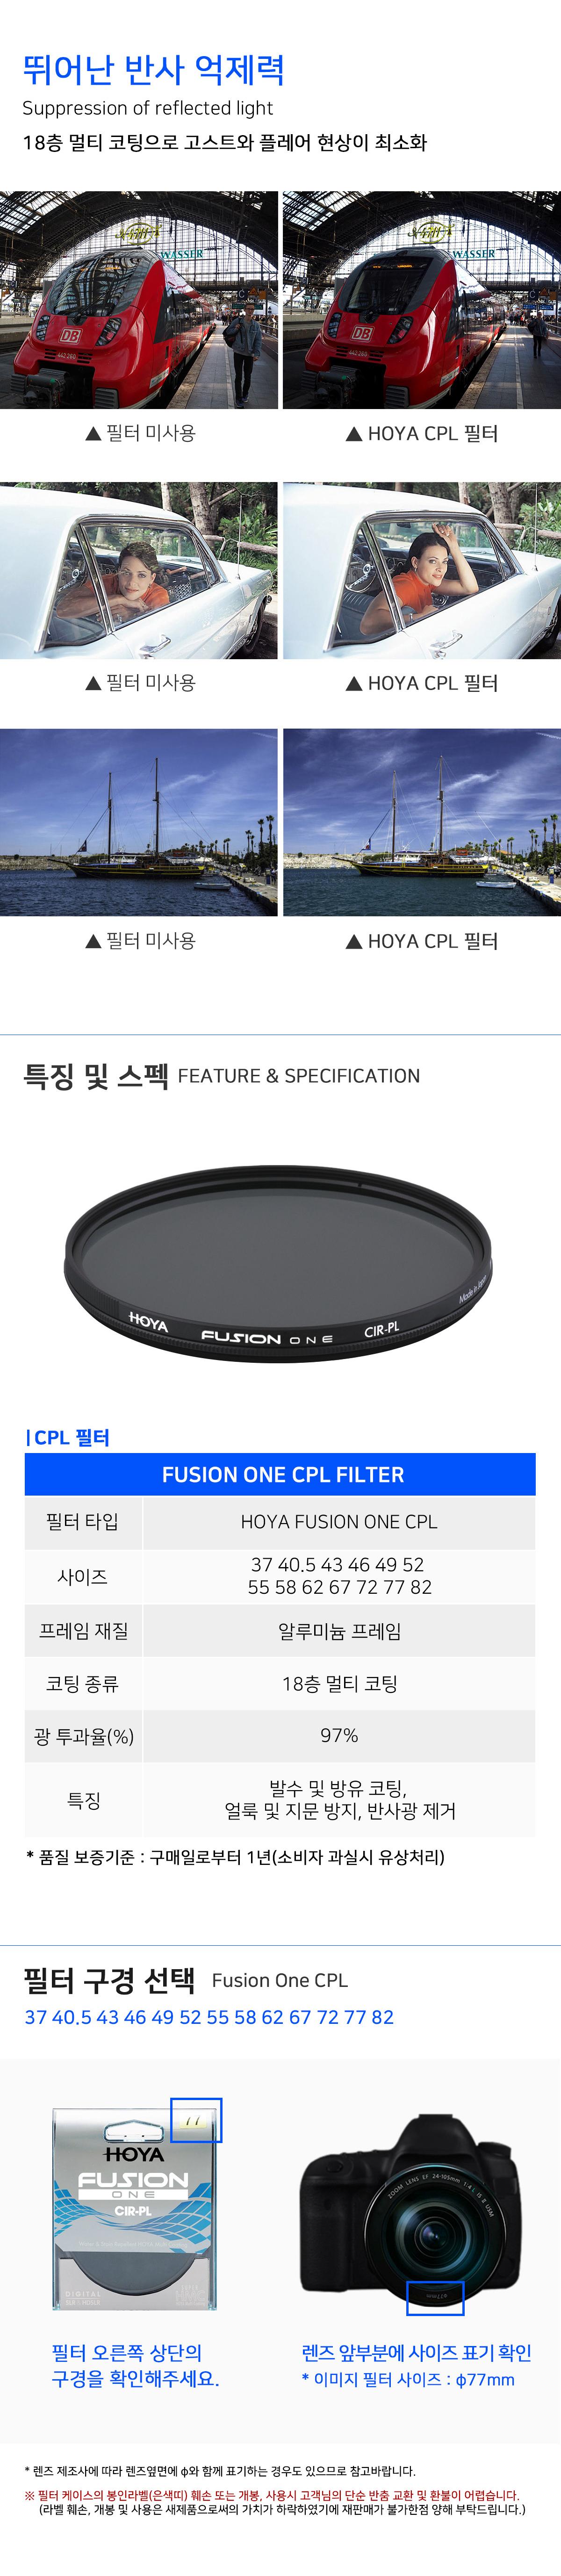 Fusion_One_CPL_04.jpg